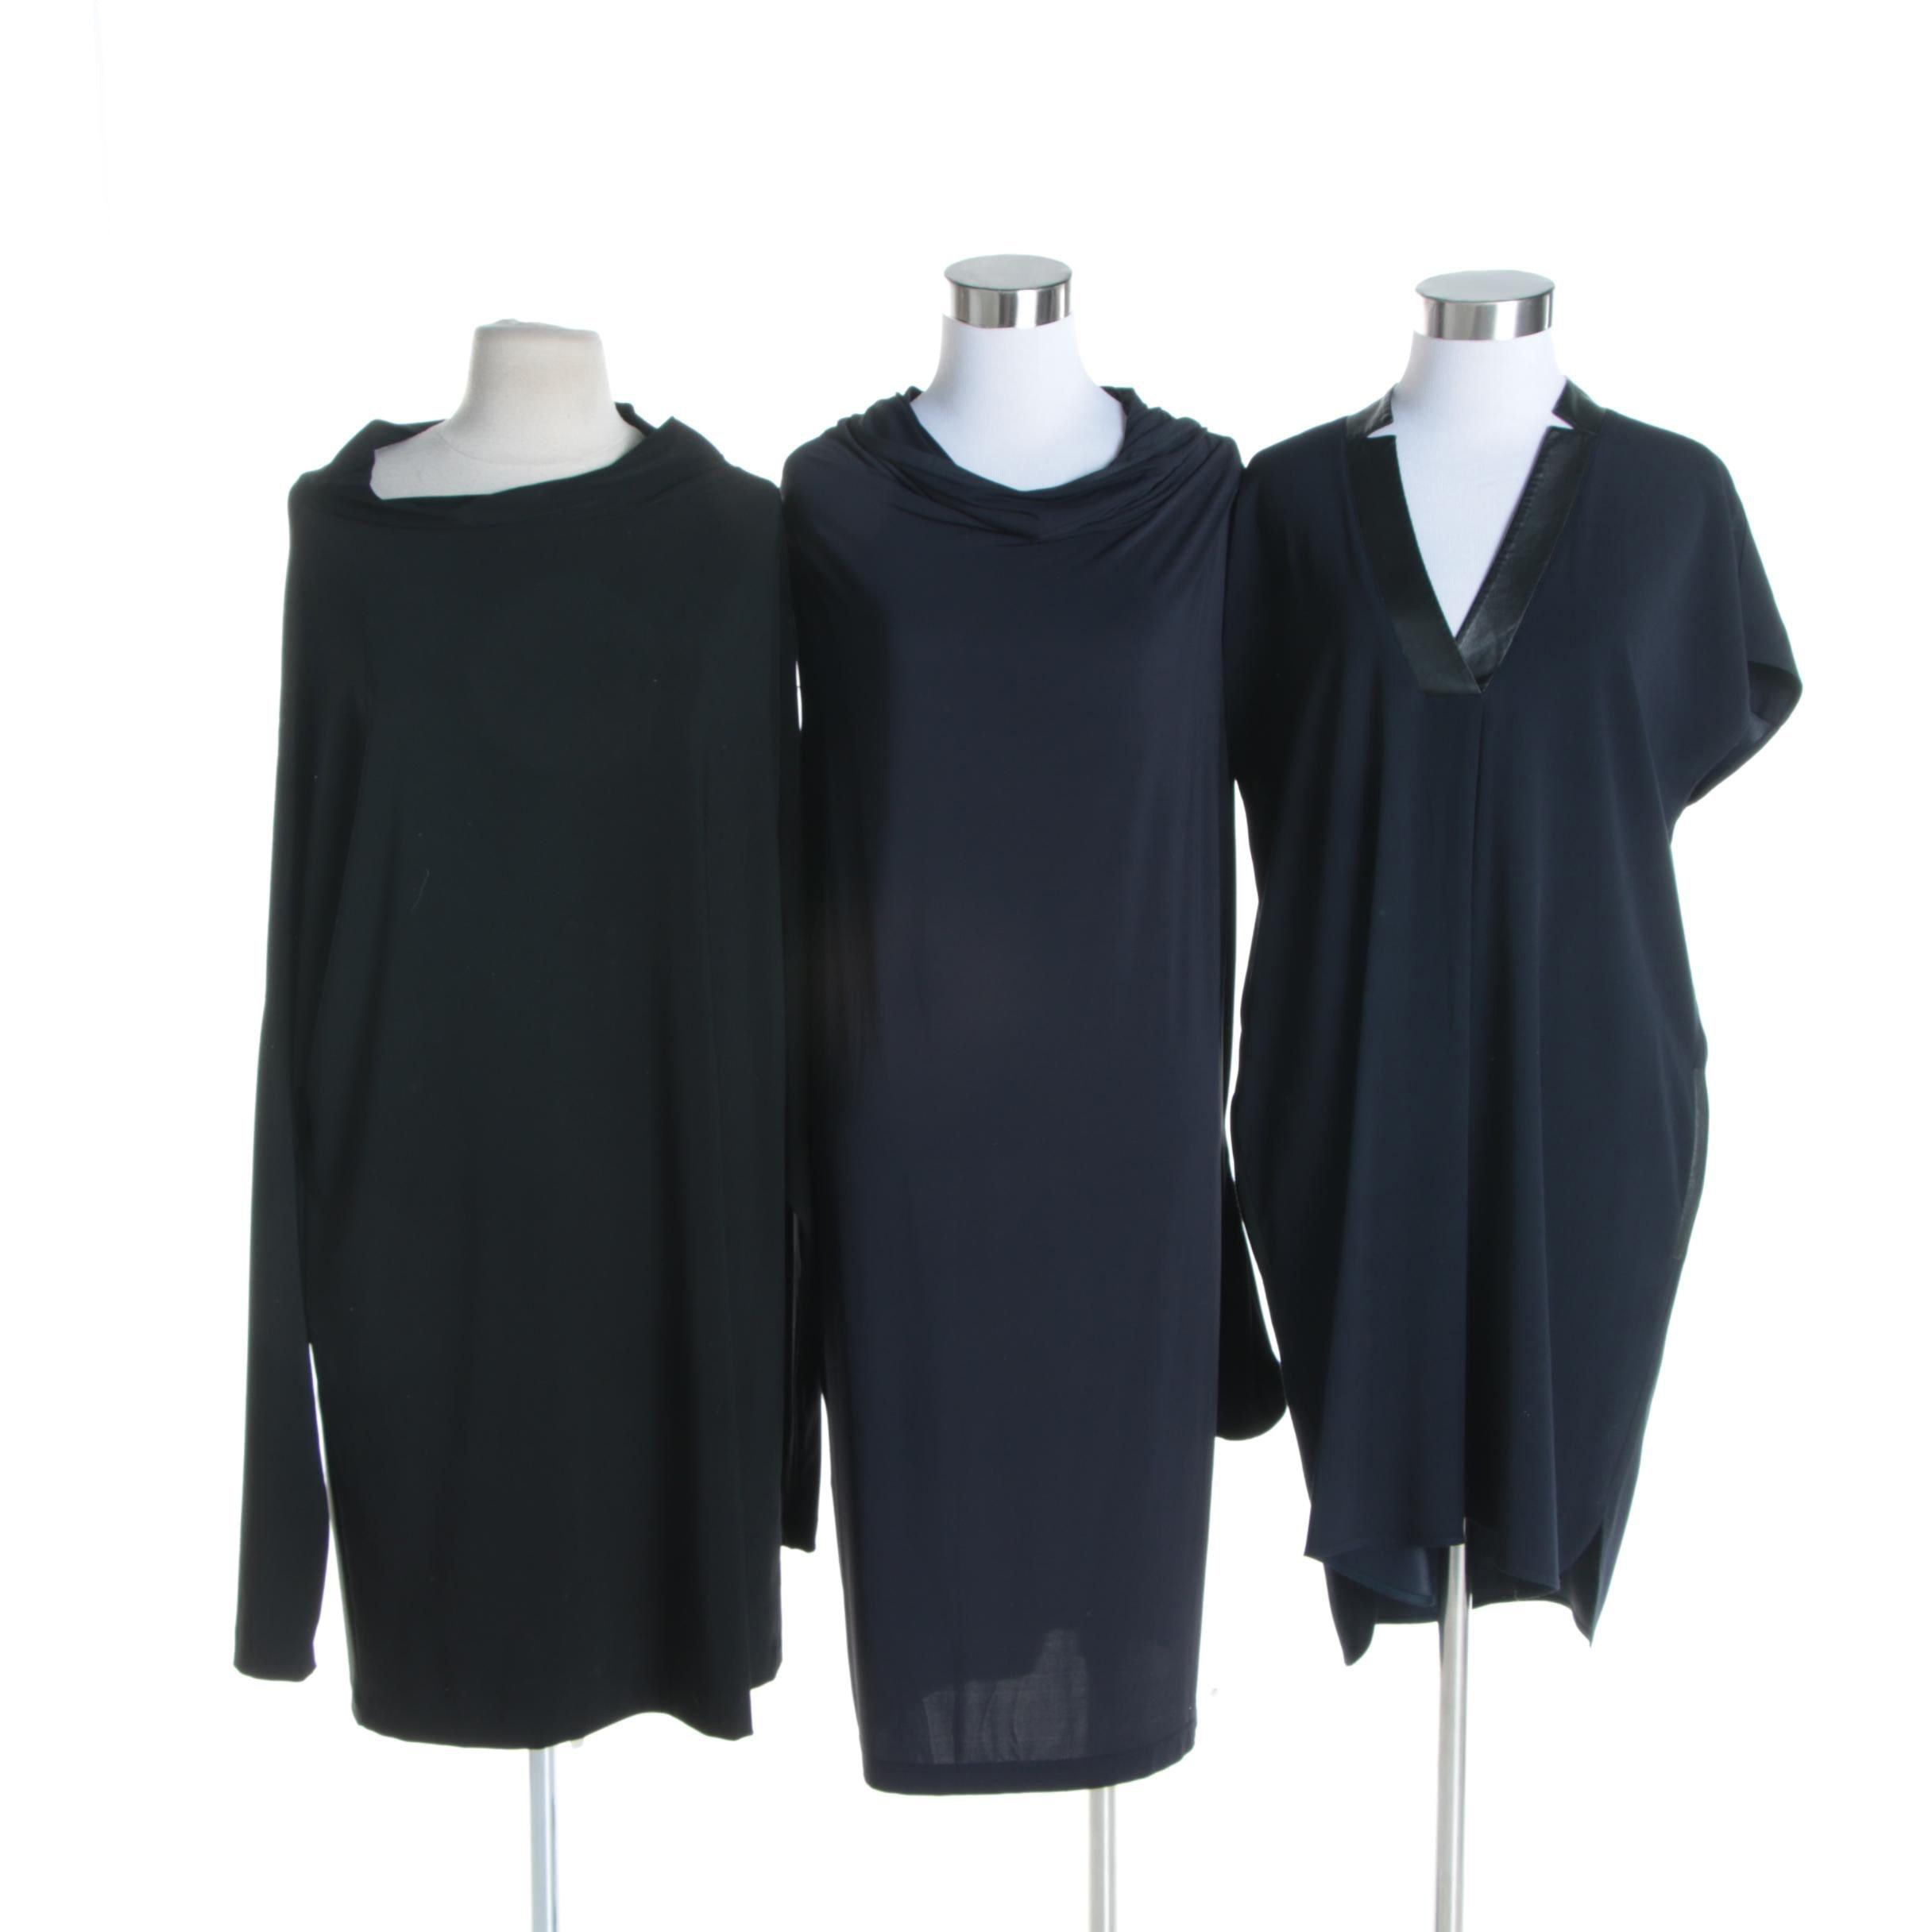 Women's Cocktail Dresses Including Liviana Conti, Kamali Kulture and Vince